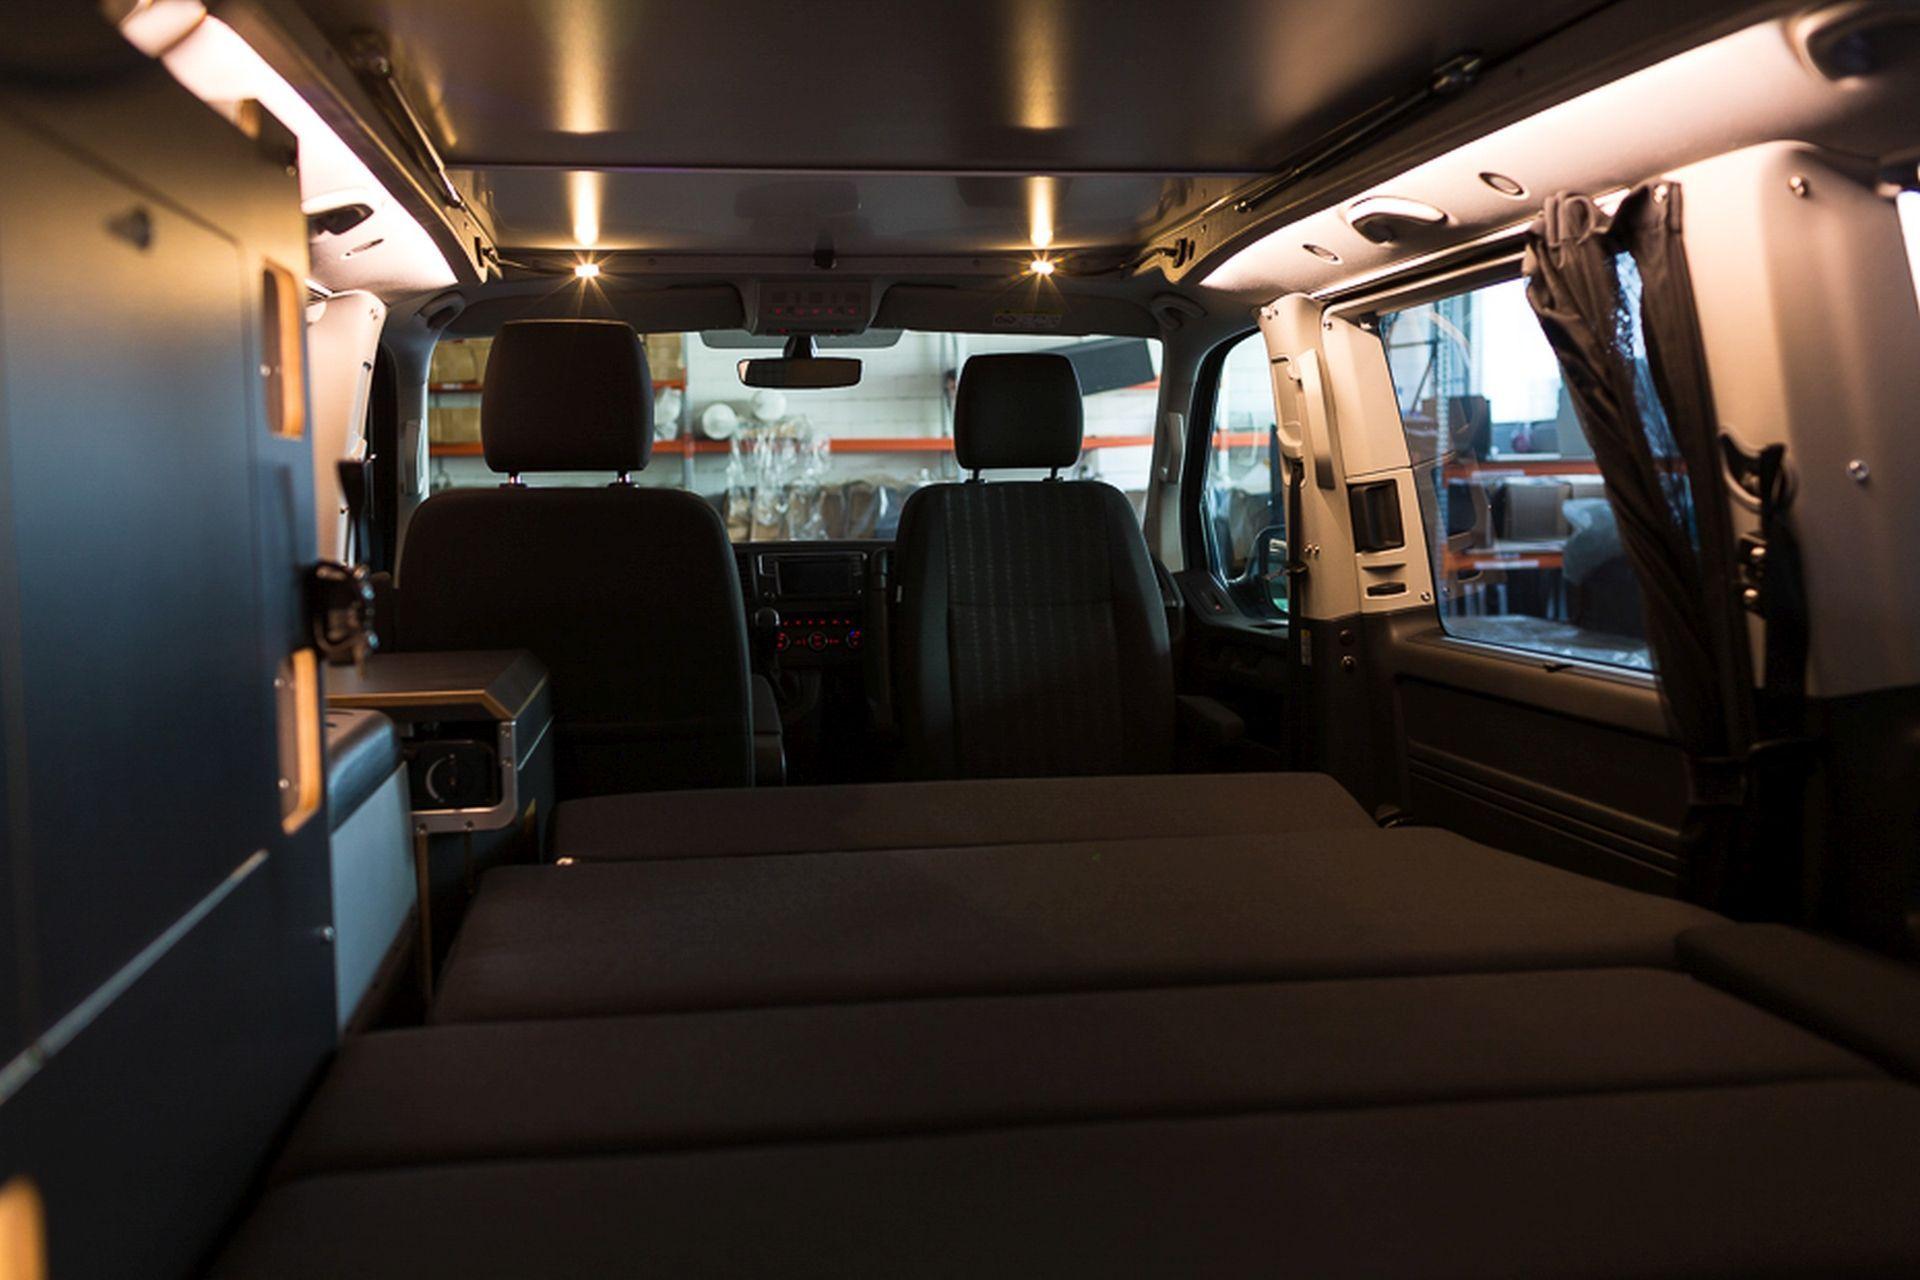 Beleuchtung Der Spacecamper Vw T6 Camping Ausbau Reisemobil Wohnmobil Campingbus Und Alltagsfahrzeug In Darmstadt Camping Ausbau Vw T6 Vw Bus Ausbau